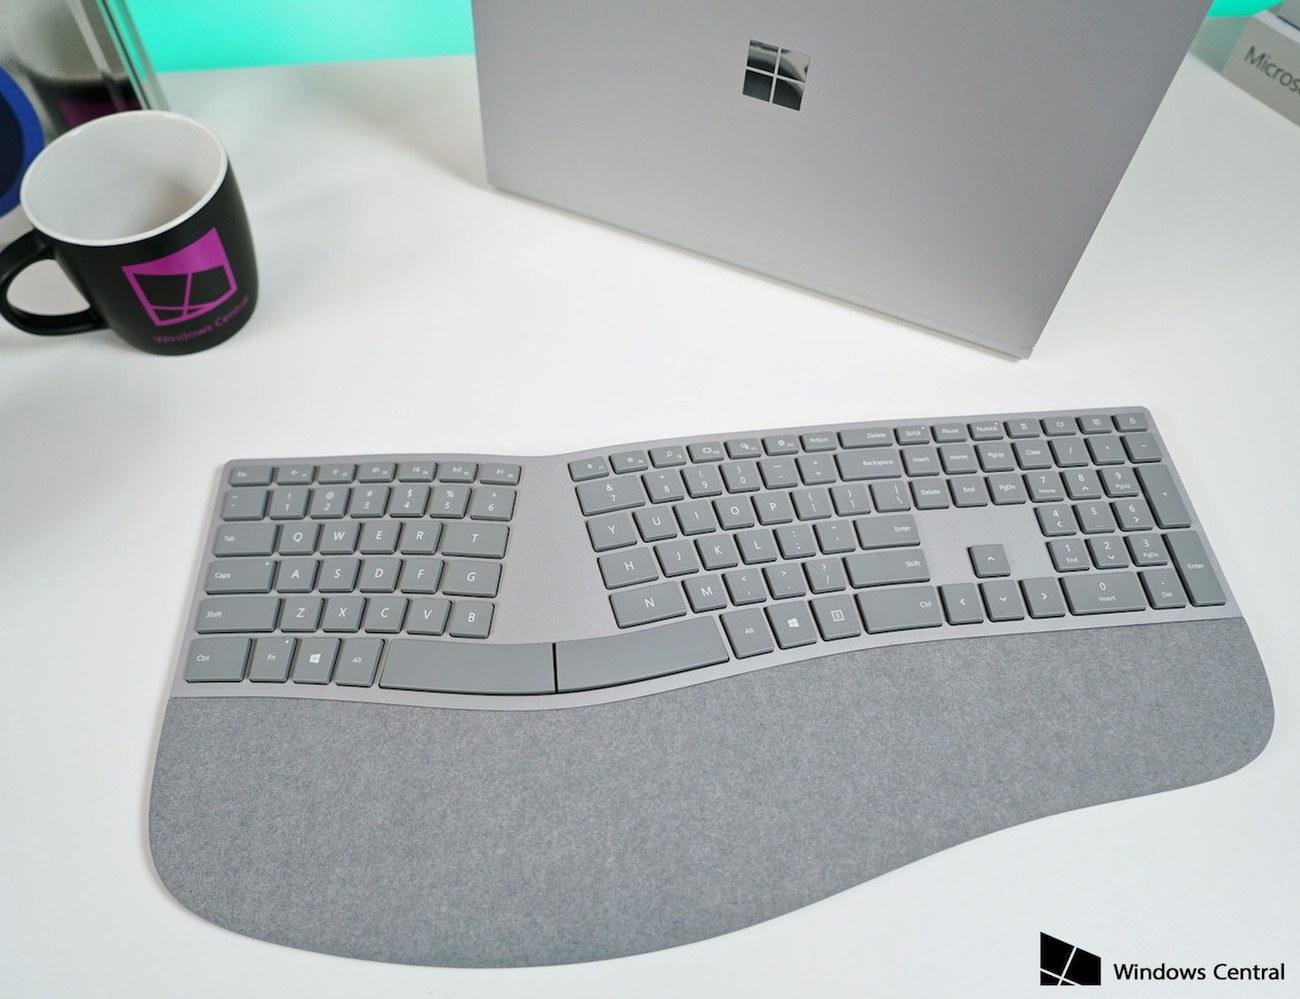 Microsoft Surface Ergonomic Keyboard Review 187 The Gadget Flow